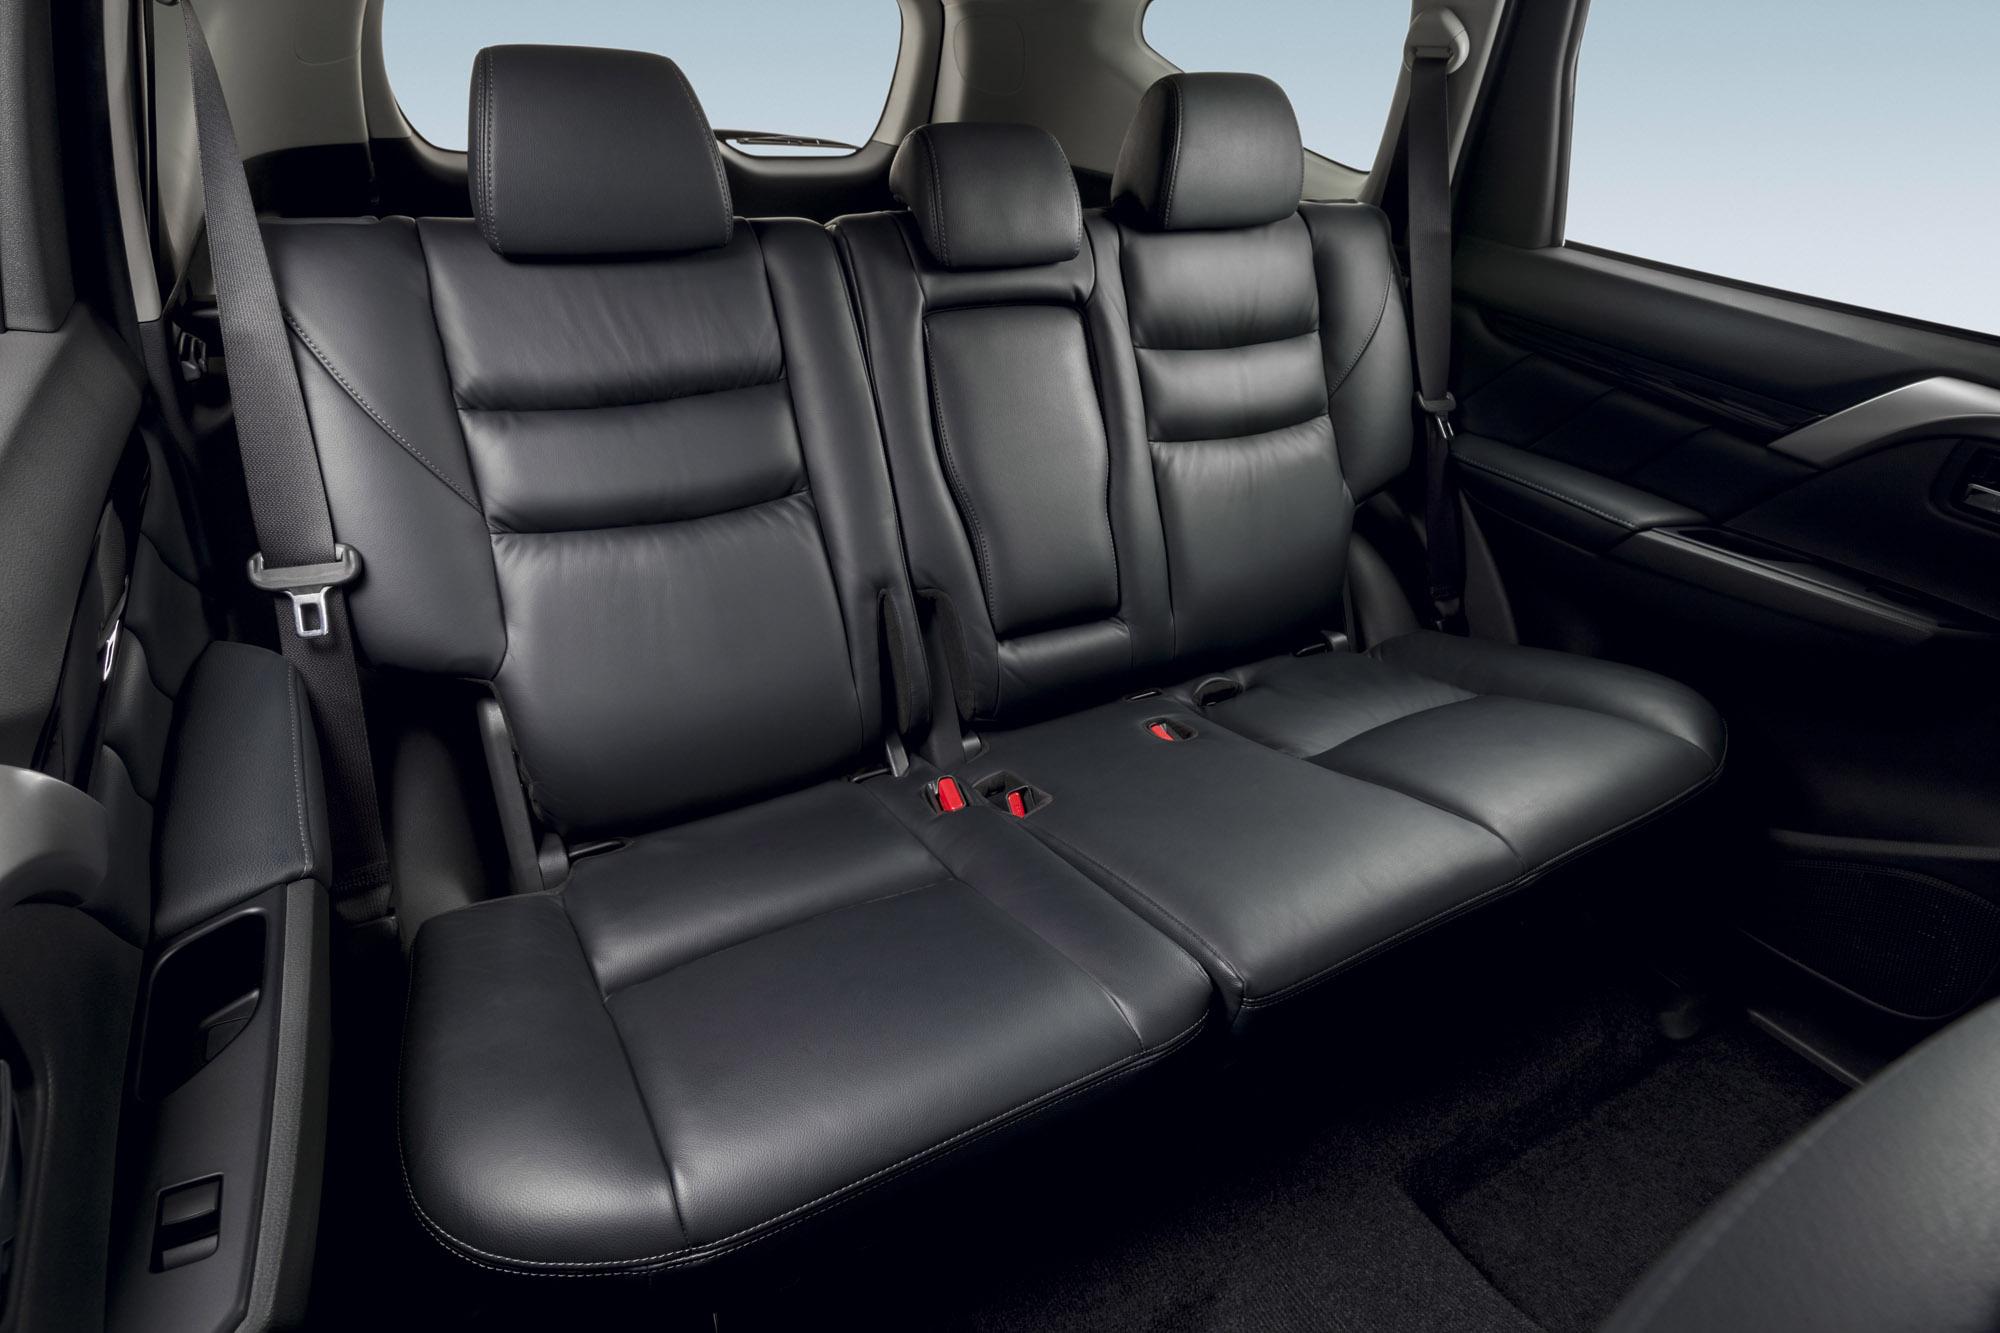 2016 Mitsubishi Pajero Sport Rear Seats Interior